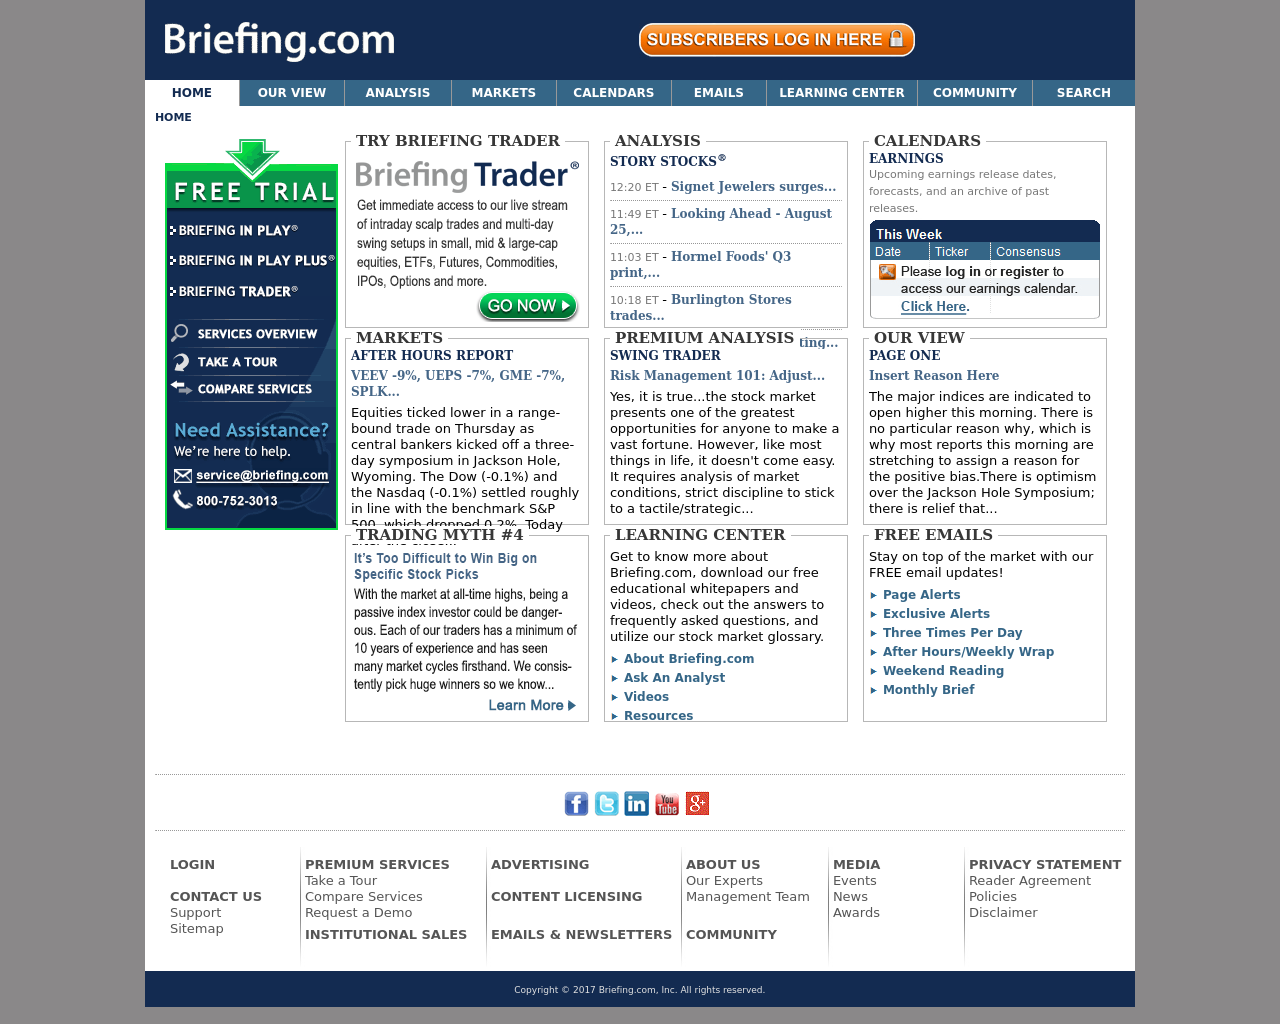 Briefing-(Live-Market-Analysis)-Advertising-Reviews-Pricing